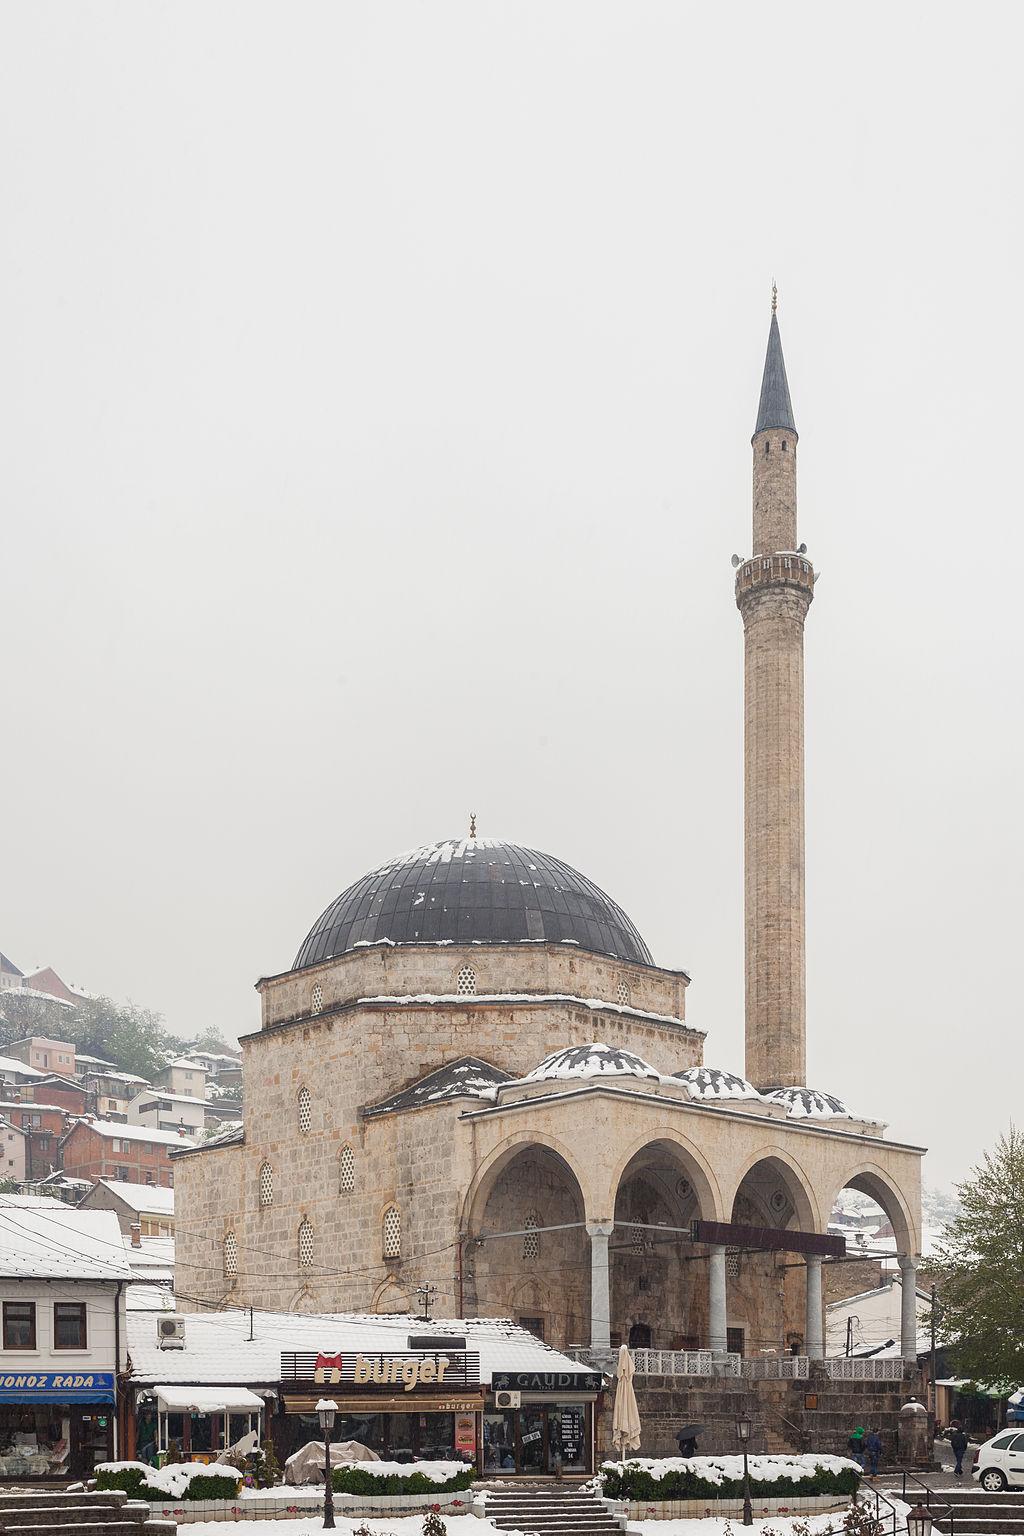 Mezquita Sinan Pasha, Prizren, Kosovo, 2014-04-16, DD 09